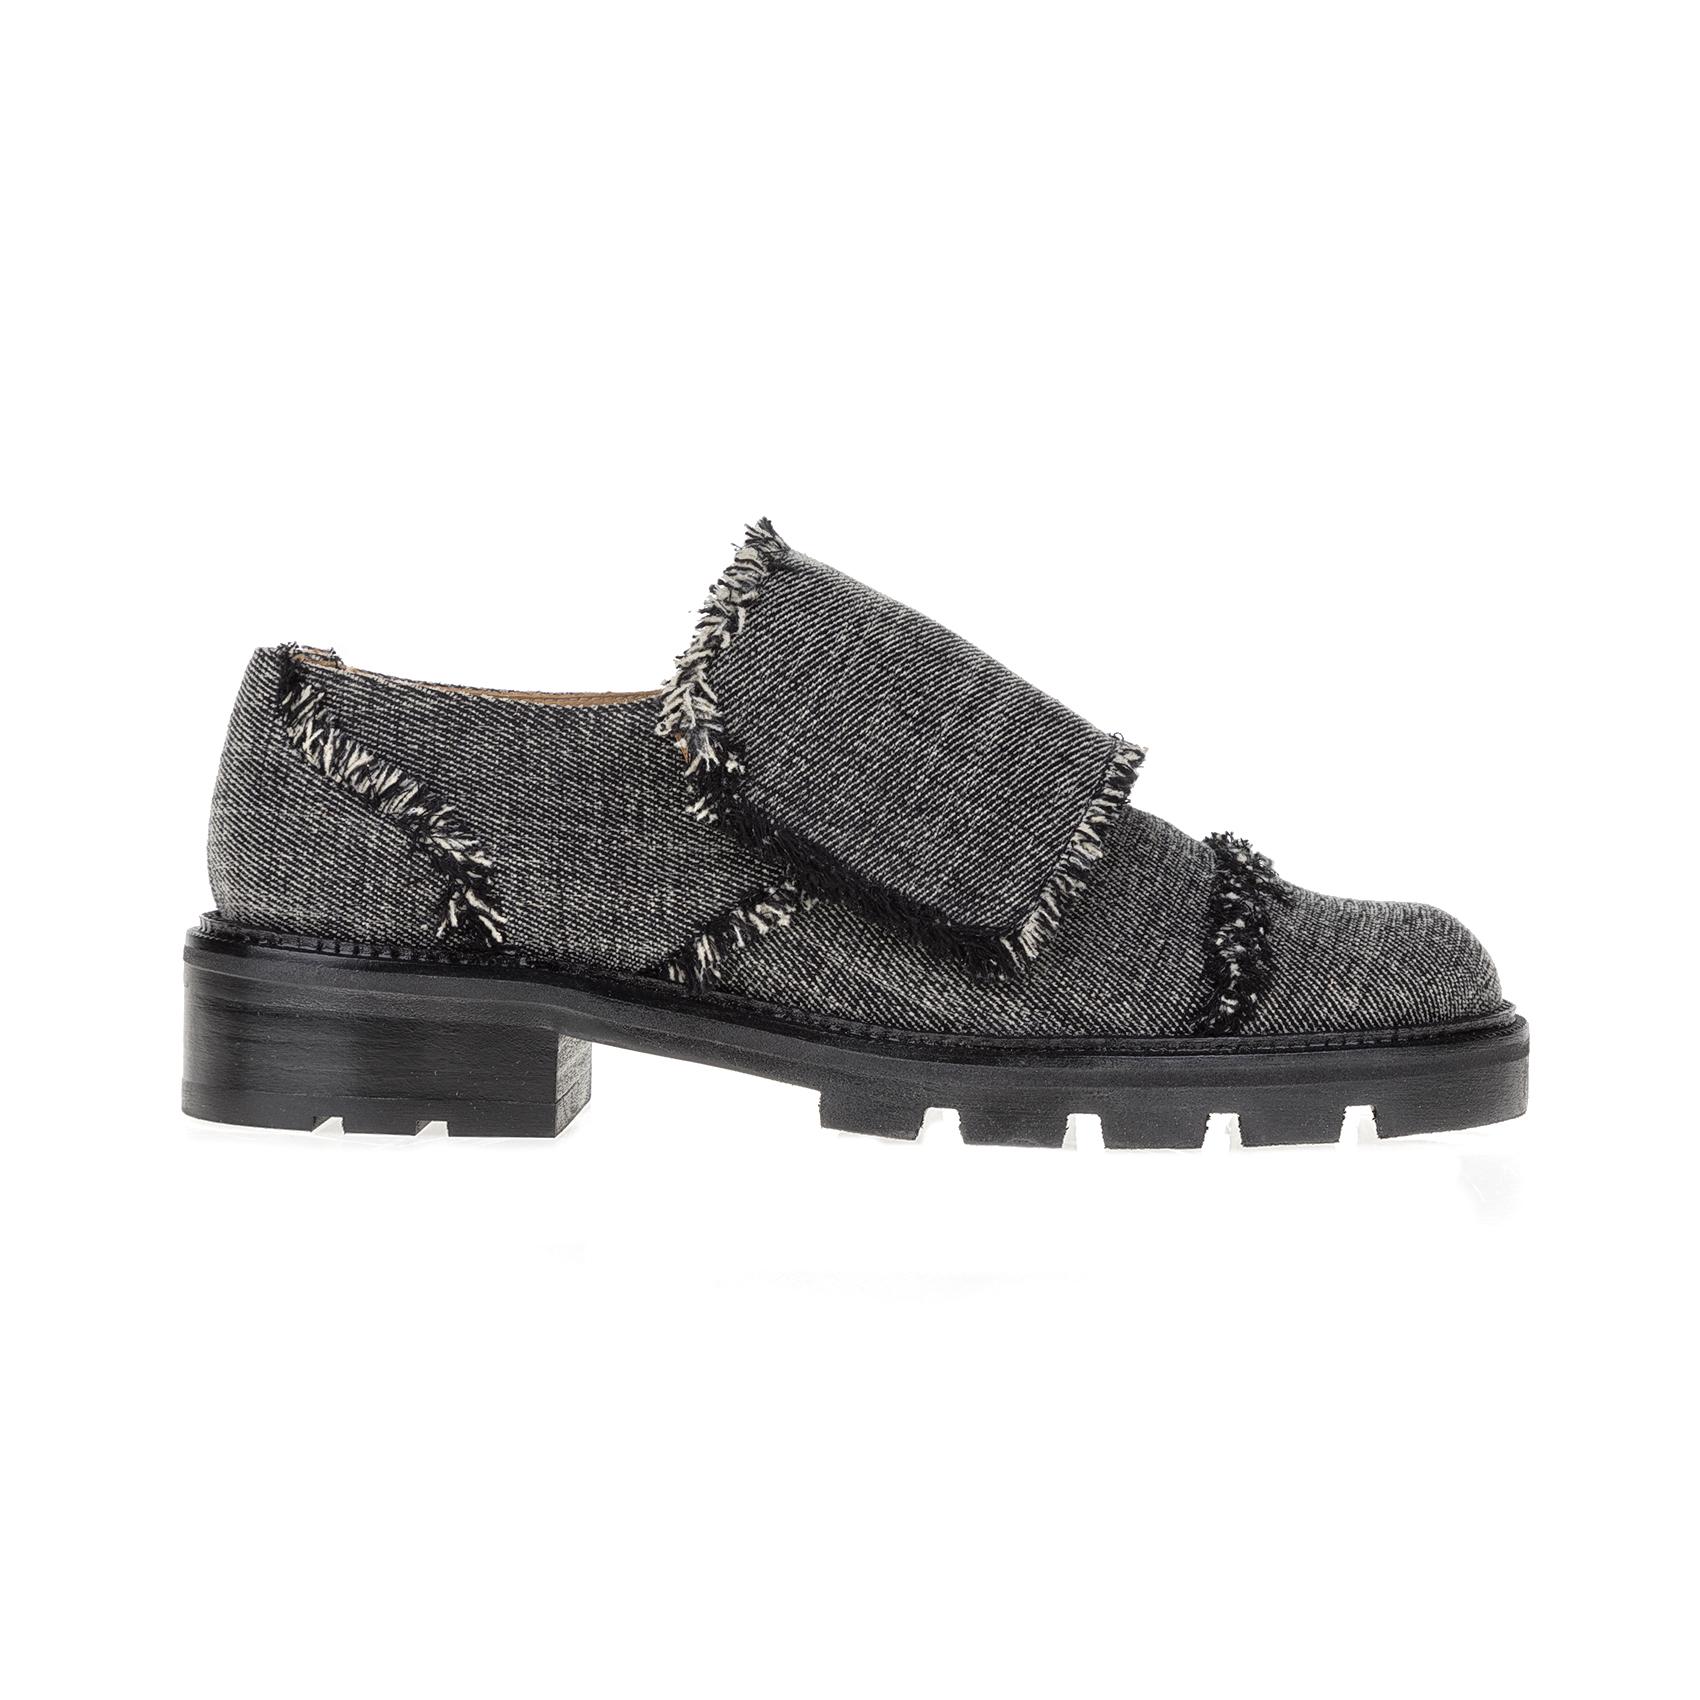 CASTANER – Γυναικεία παπούτσια Castaner γκρι